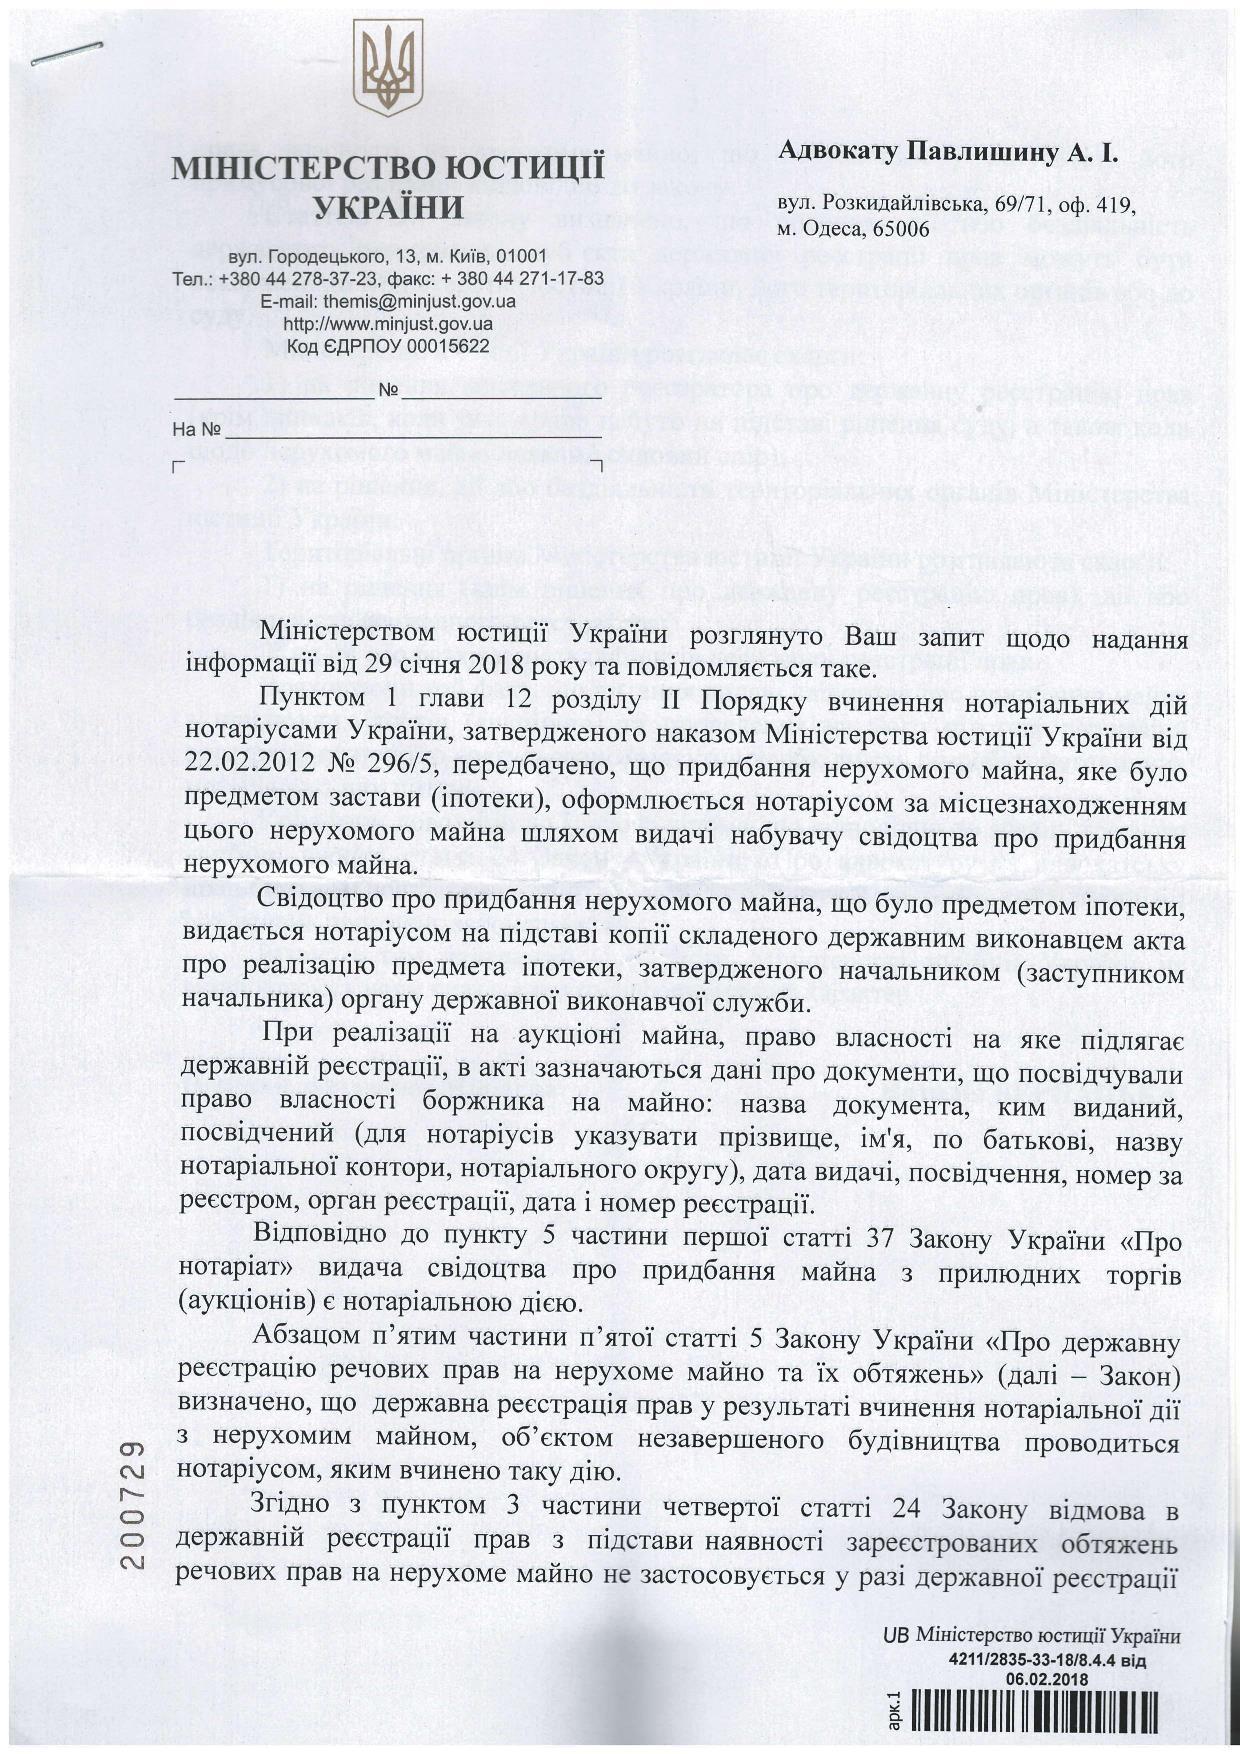 image http://forum.setam.net.ua/assets/images/79-xbt2kn8f7SNFDMni.jpeg